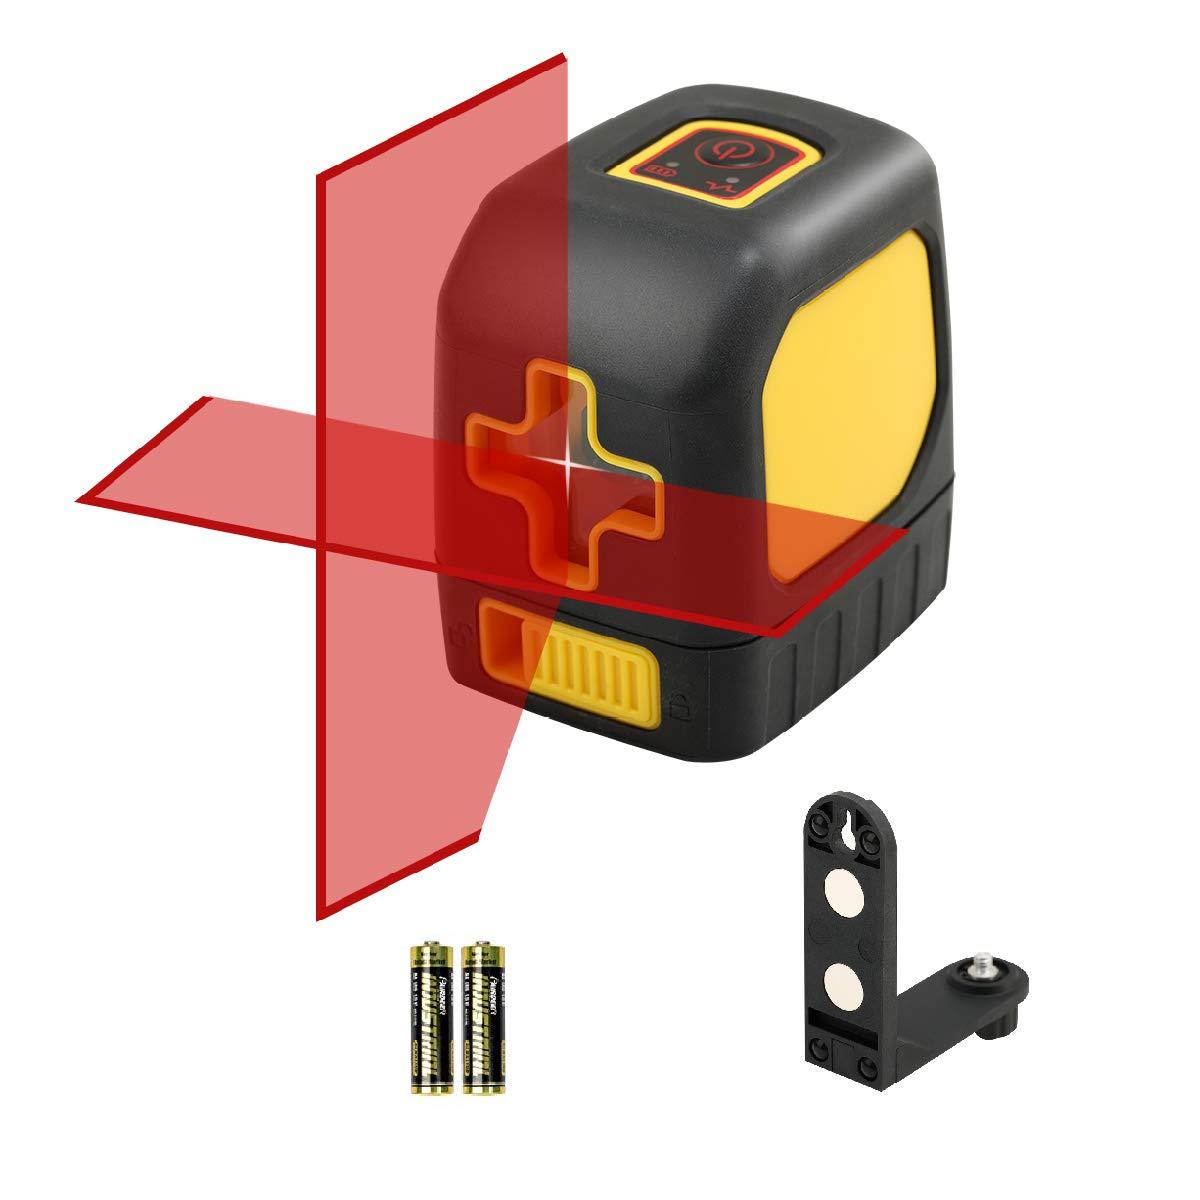 Nivel láser, láser DLEADER Cross Line rojo con láser de línea horizontal y vertical autonivelante conmutable, giratorio de 360 grados con base magnética flexible, batería incluida (Rojo)